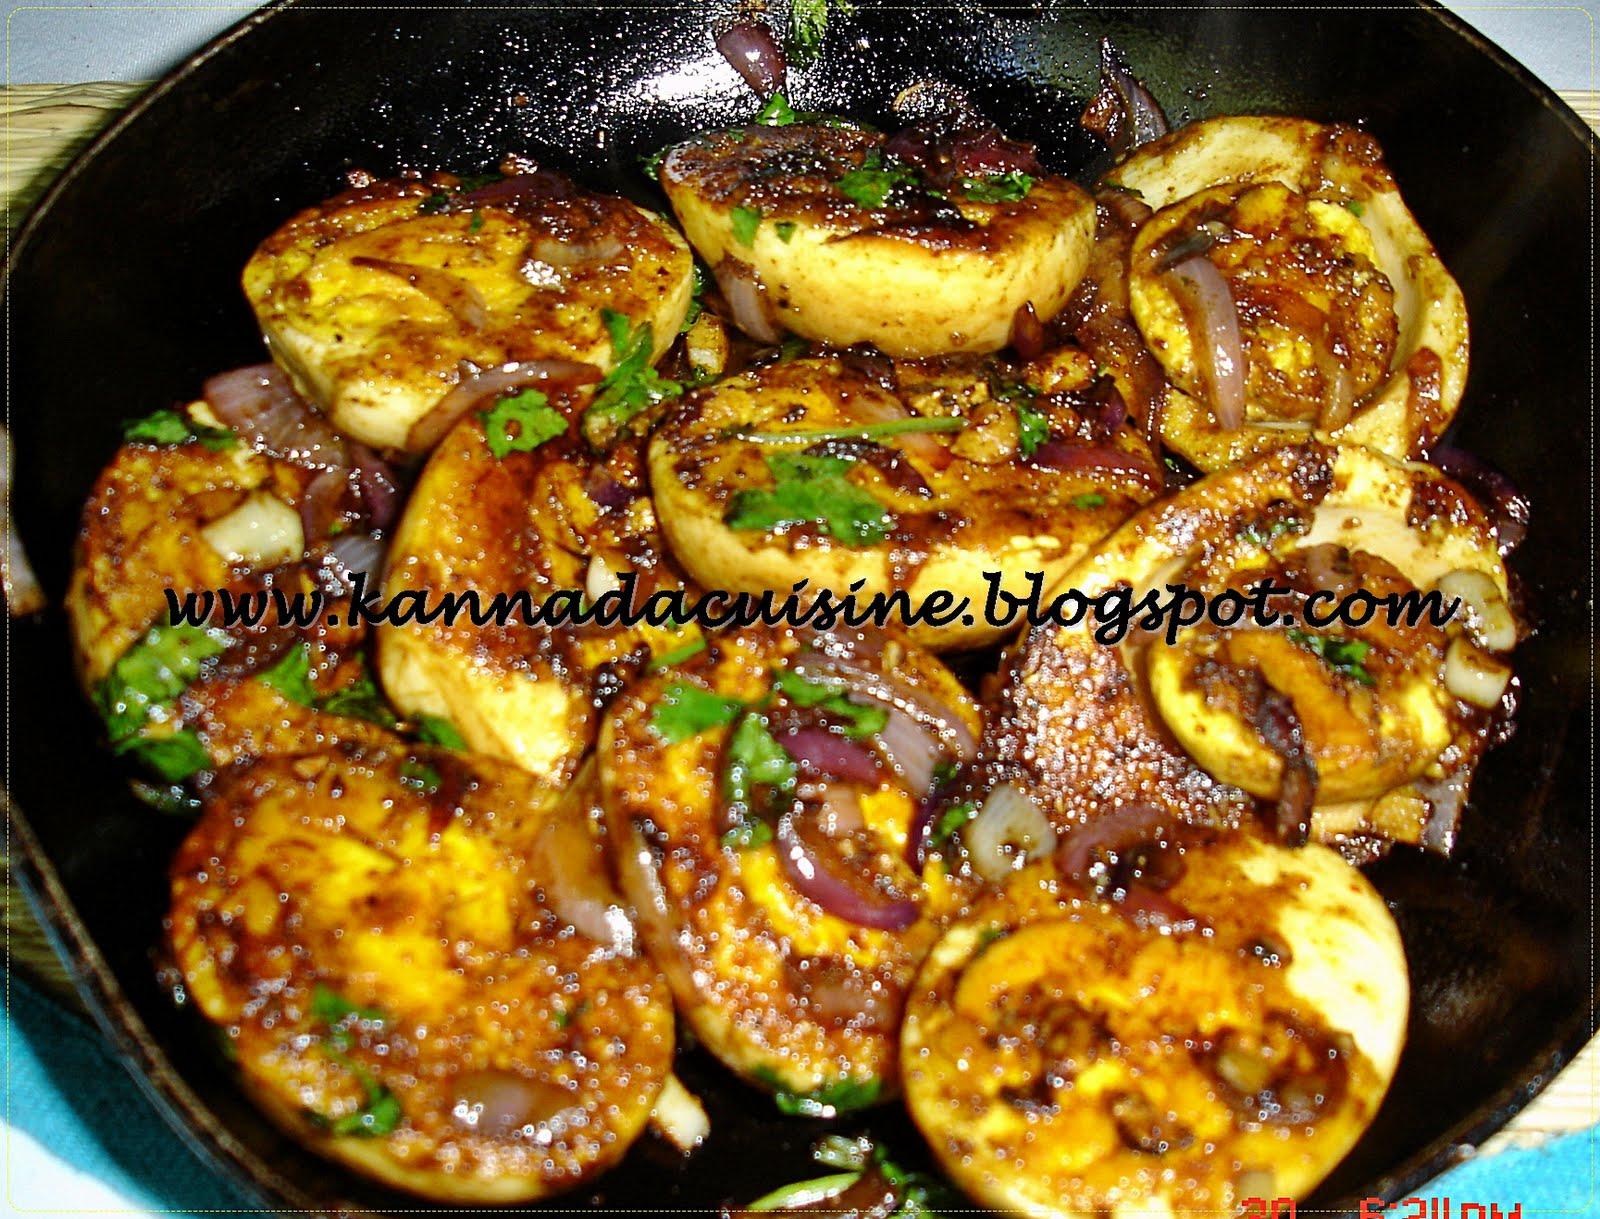 Kannada cuisine chilli egg kannada cuisine forumfinder Images